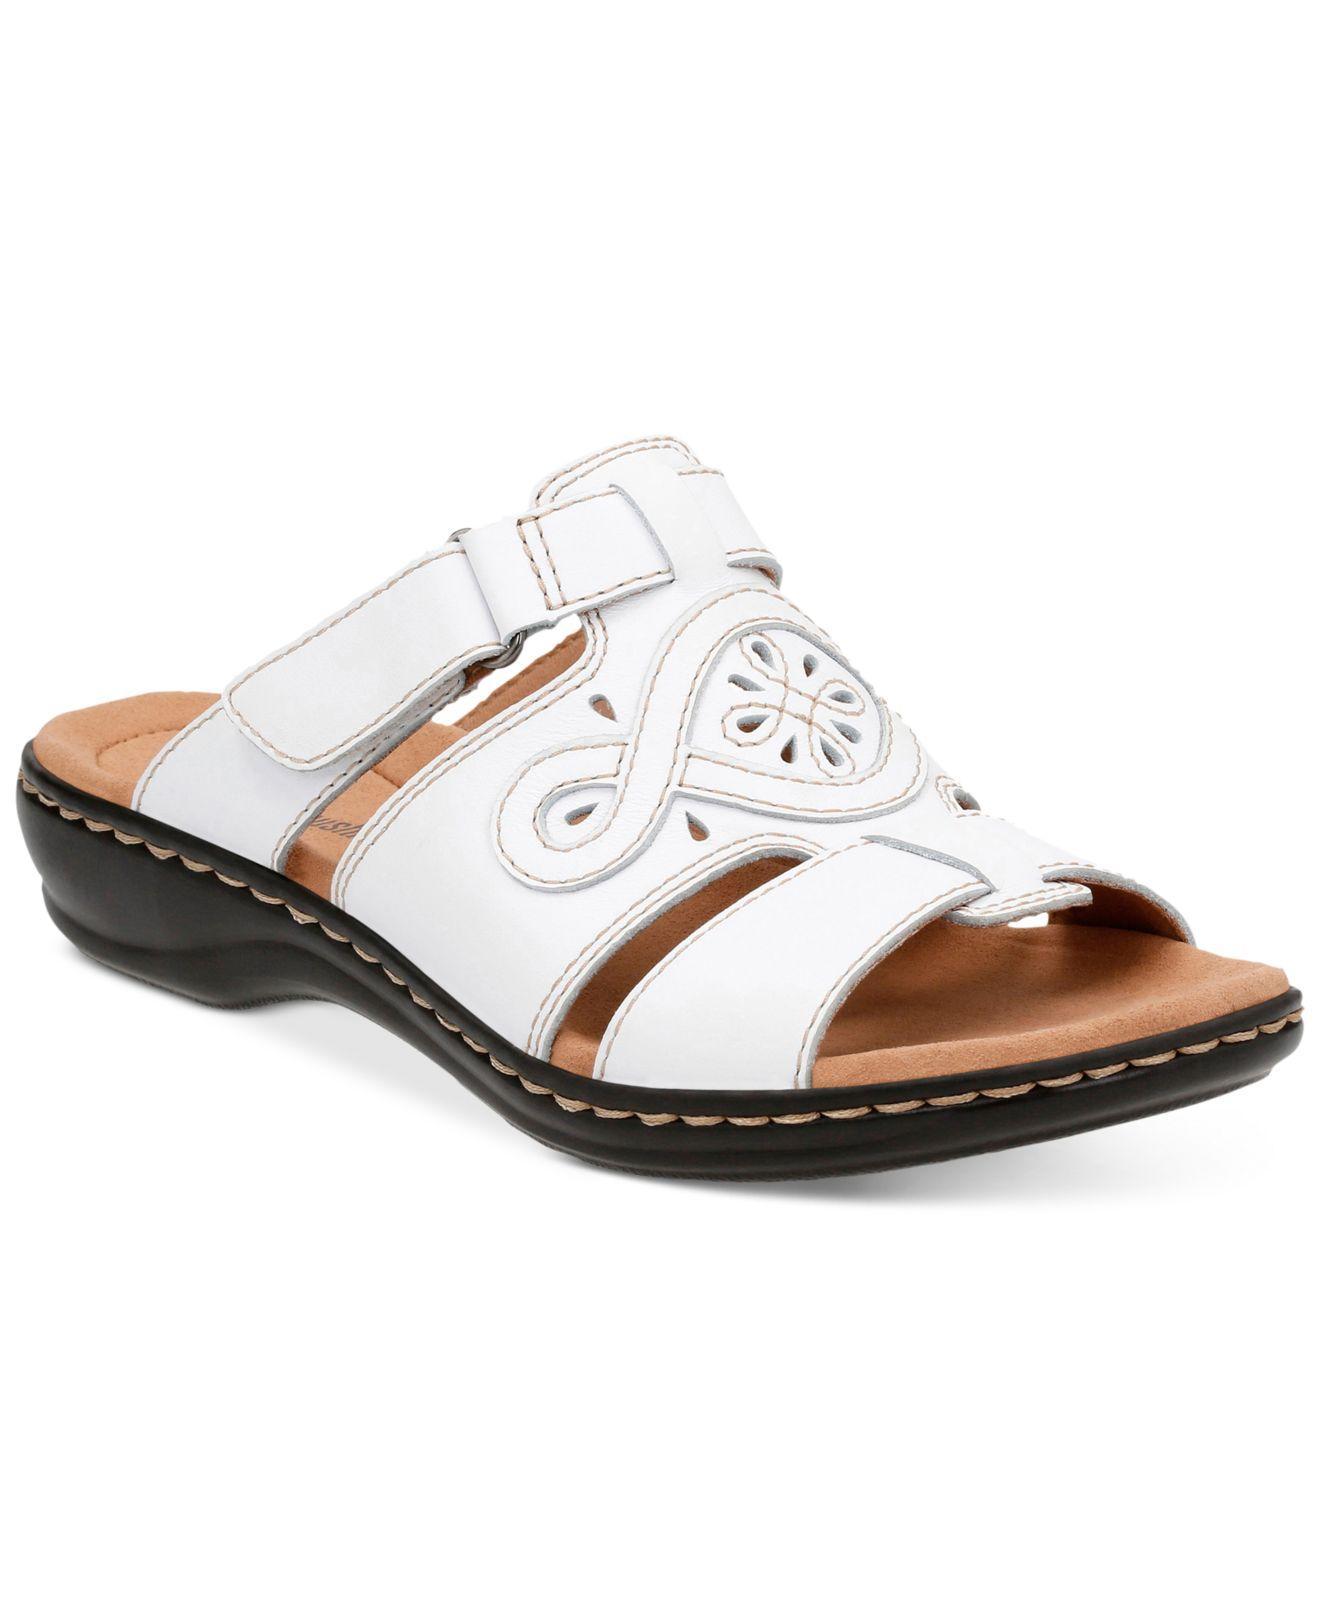 Clarks Women's Leisa Higley Flat Sandals In White